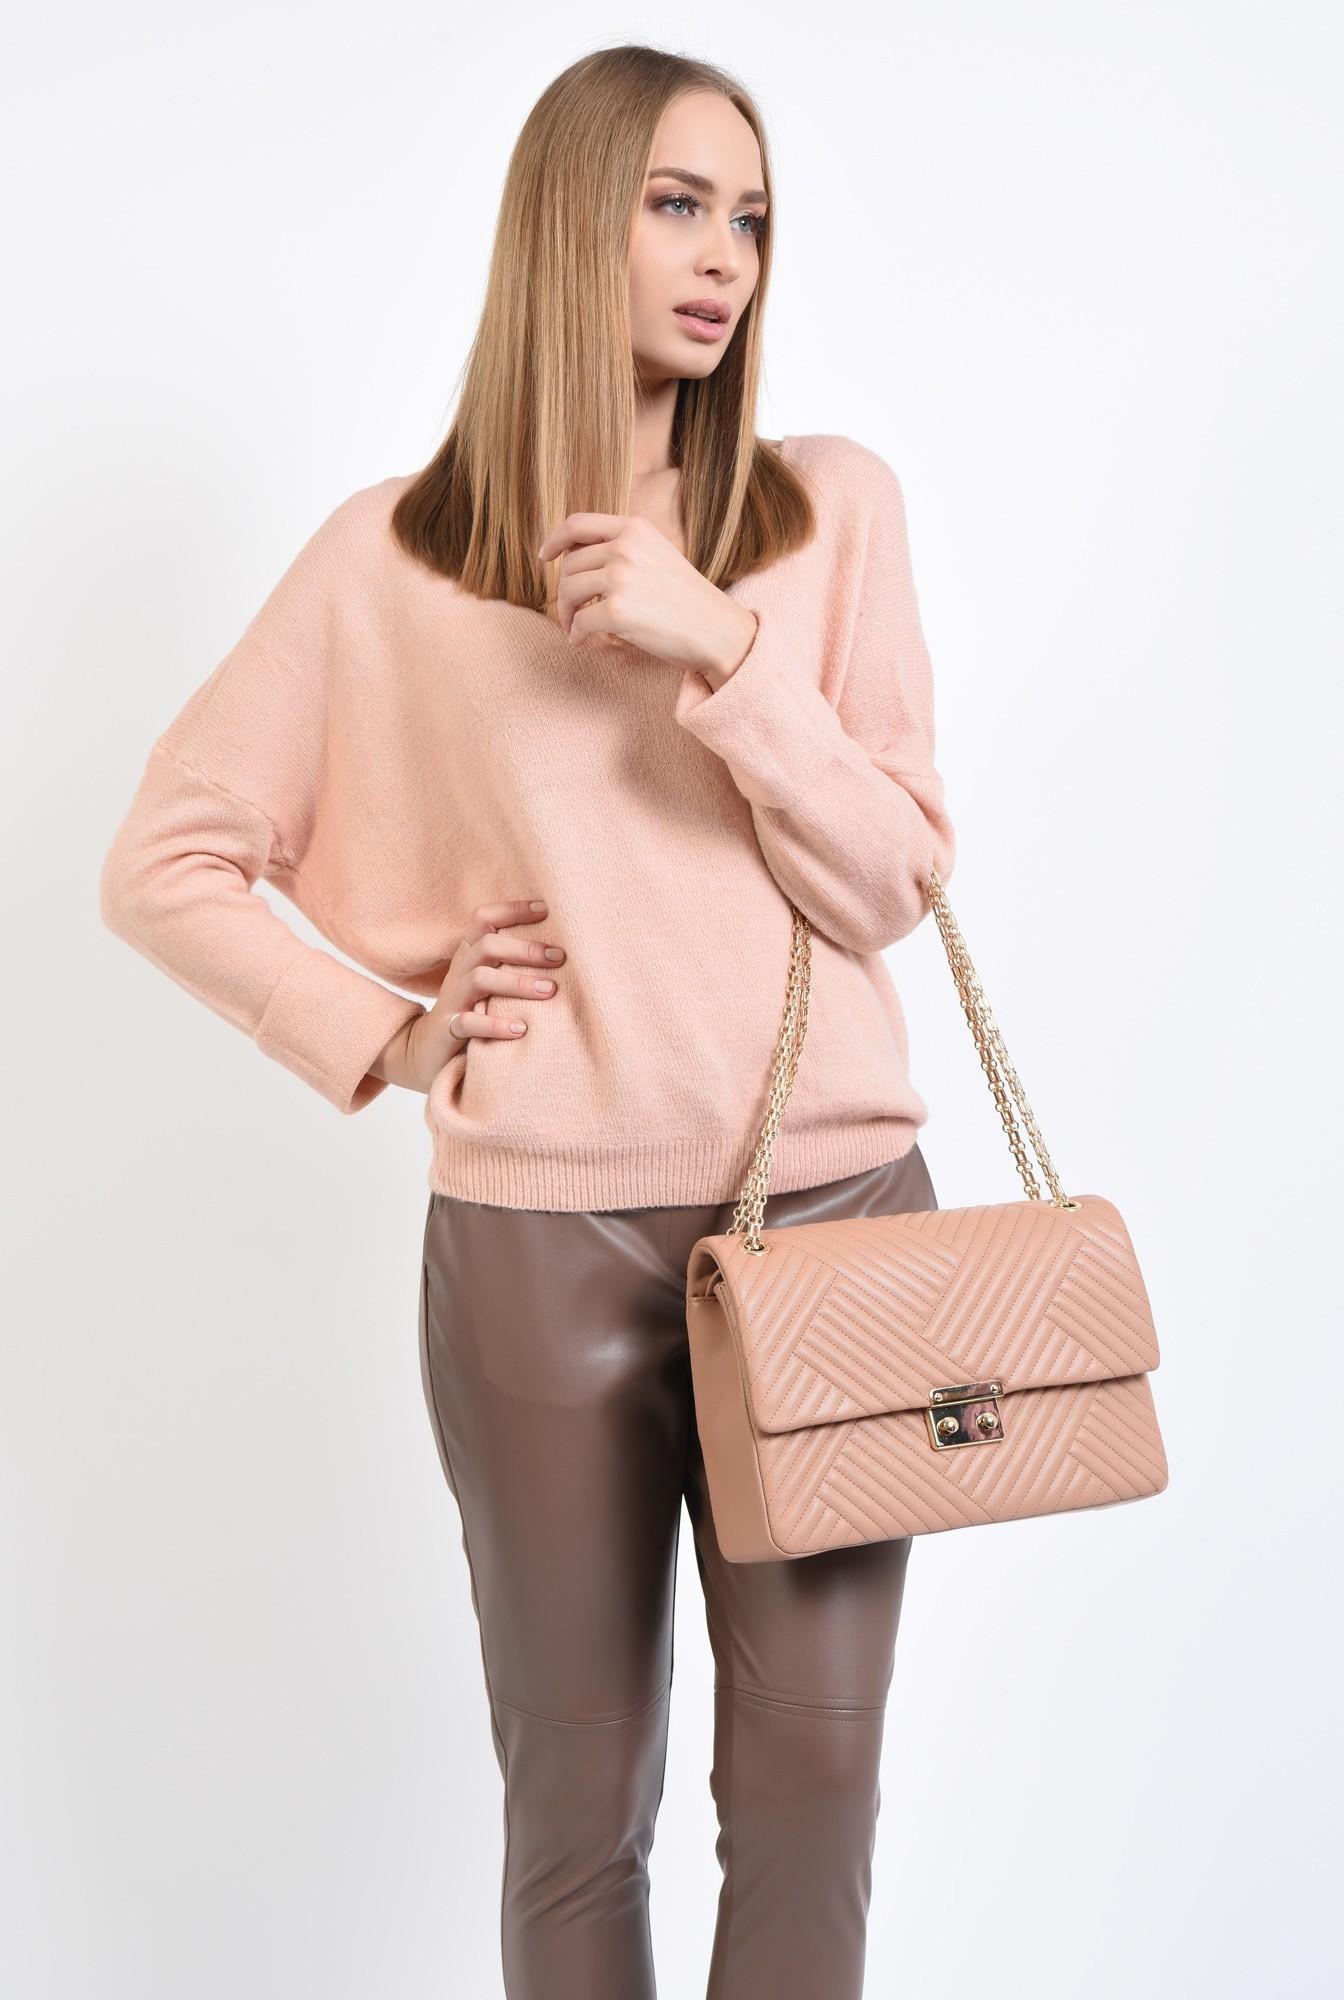 0 - 360 - pulover dama, online, tricotaje, roz, bordura reiata